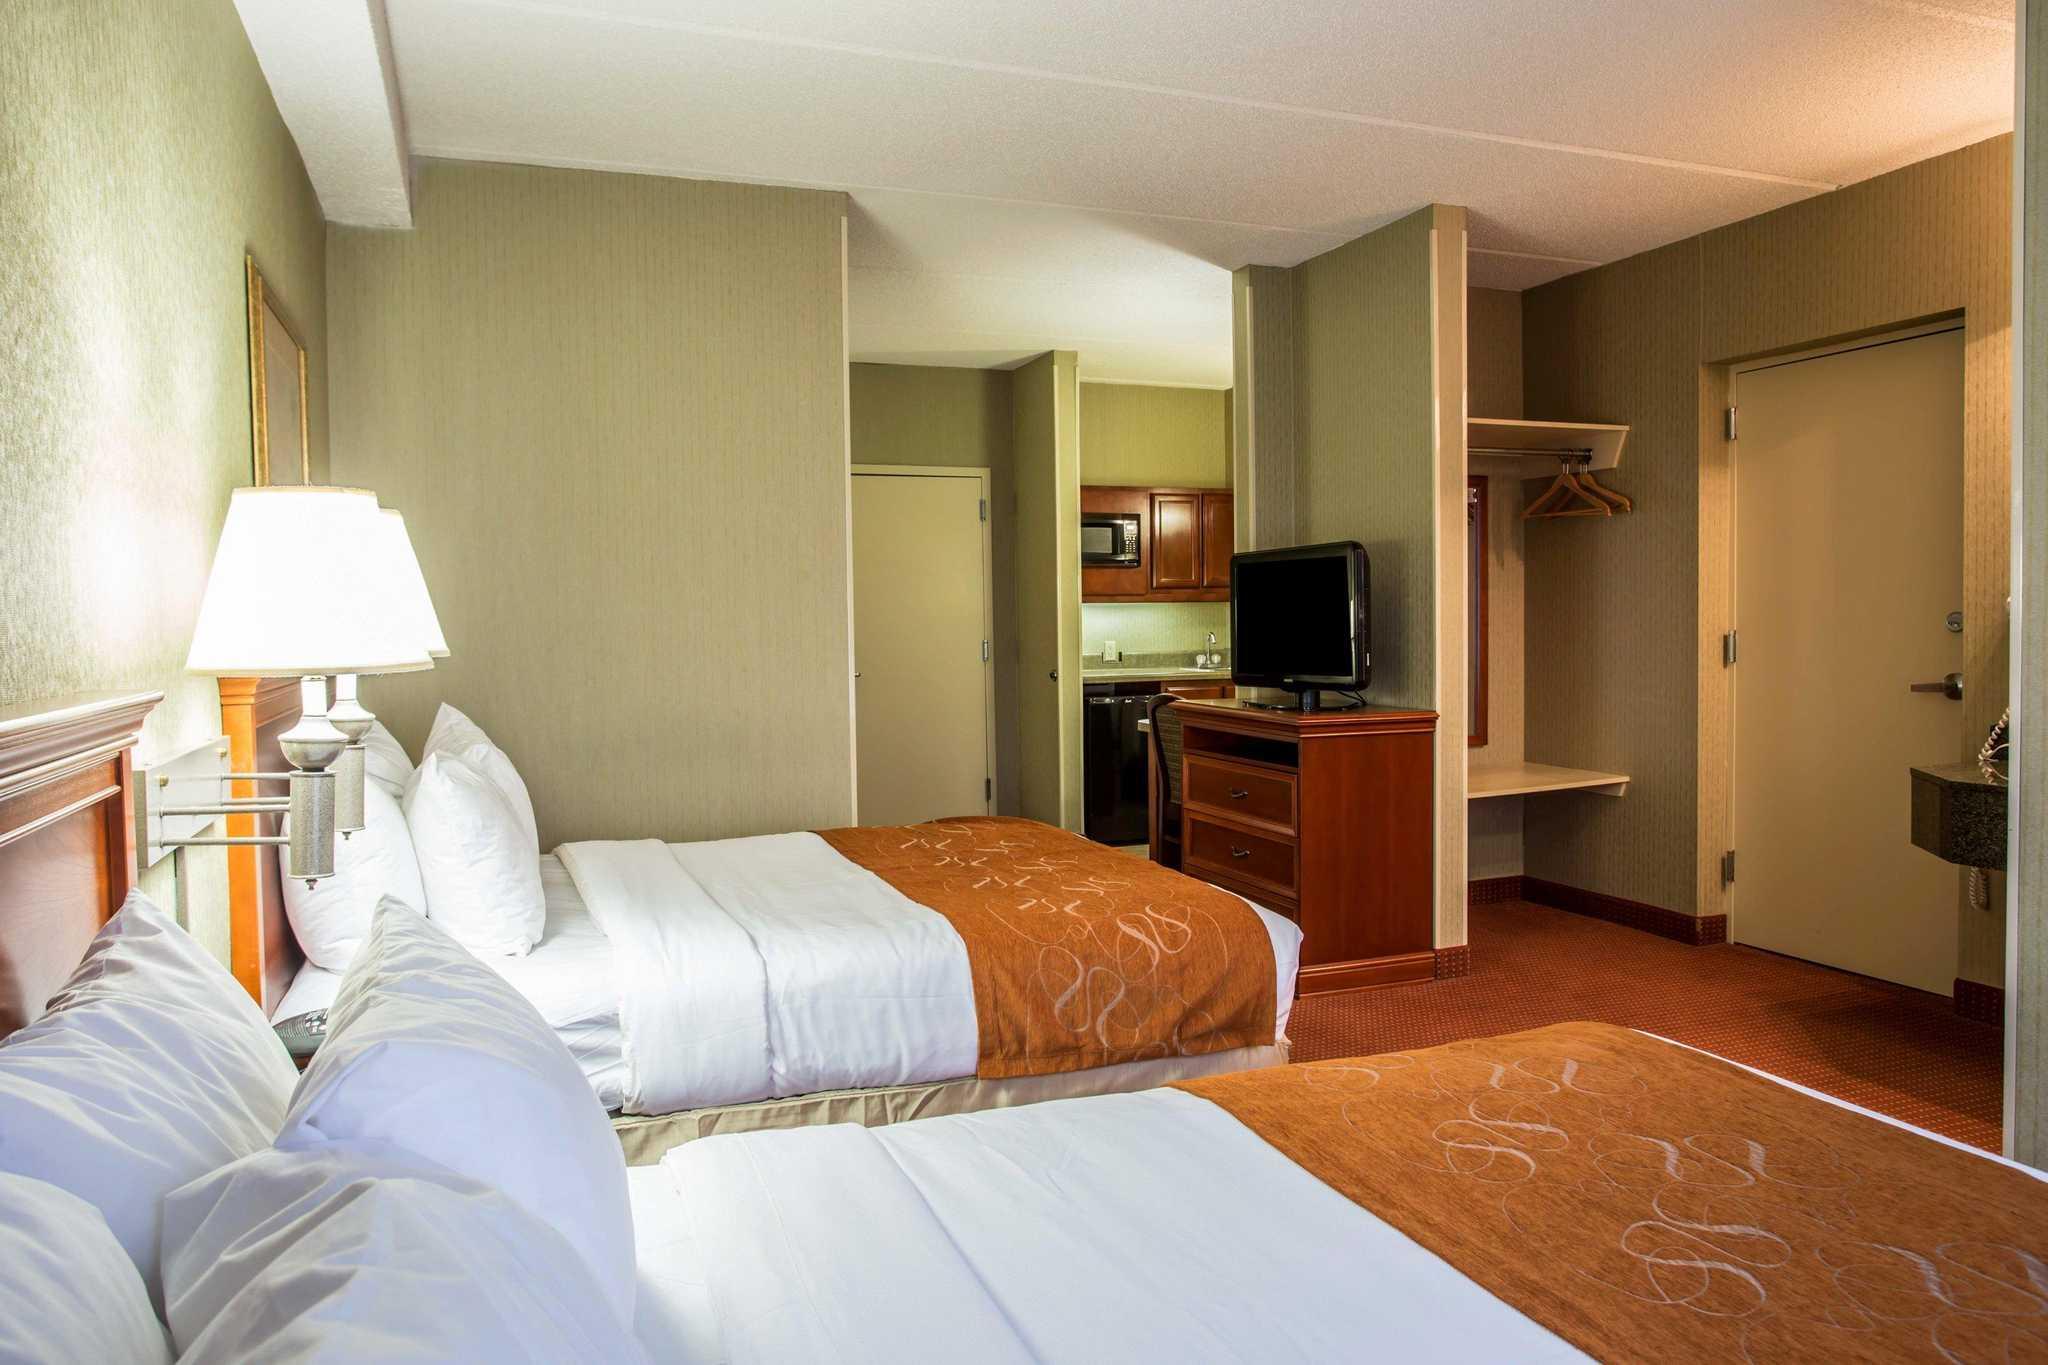 Comfort Suites Northlake image 4